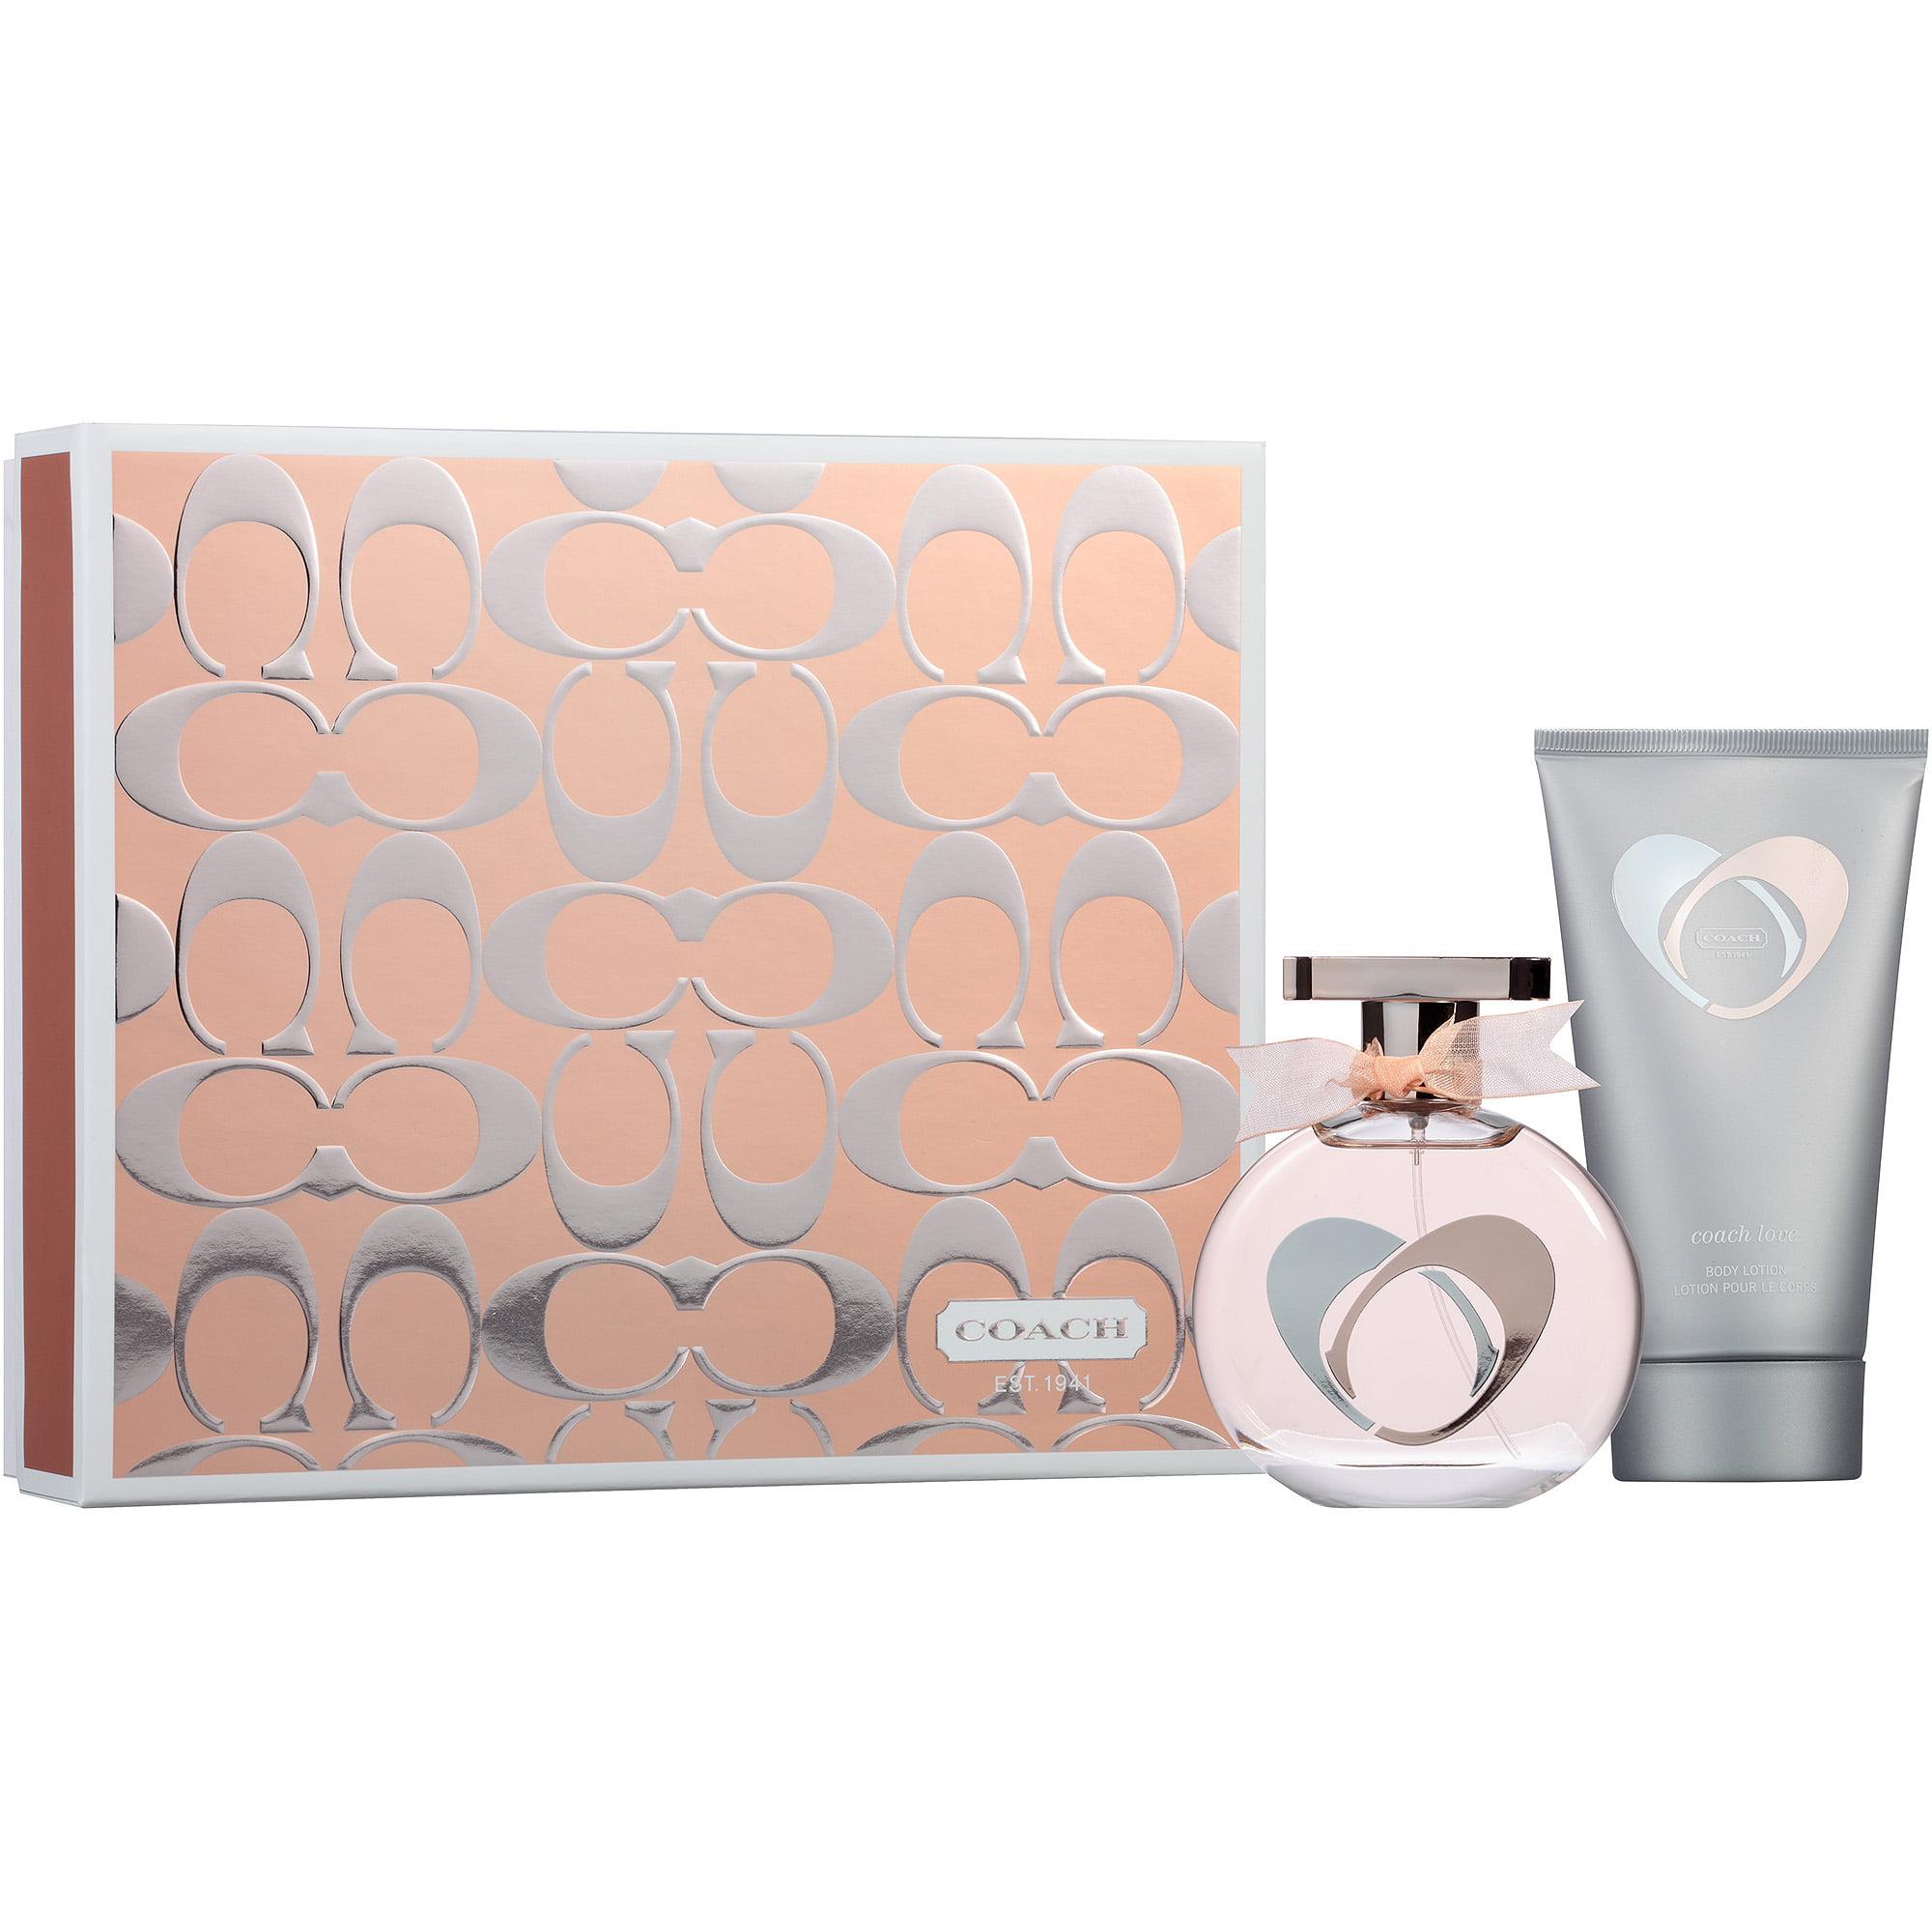 Coach Love Fragrance Gift Set for Women, 2 pc